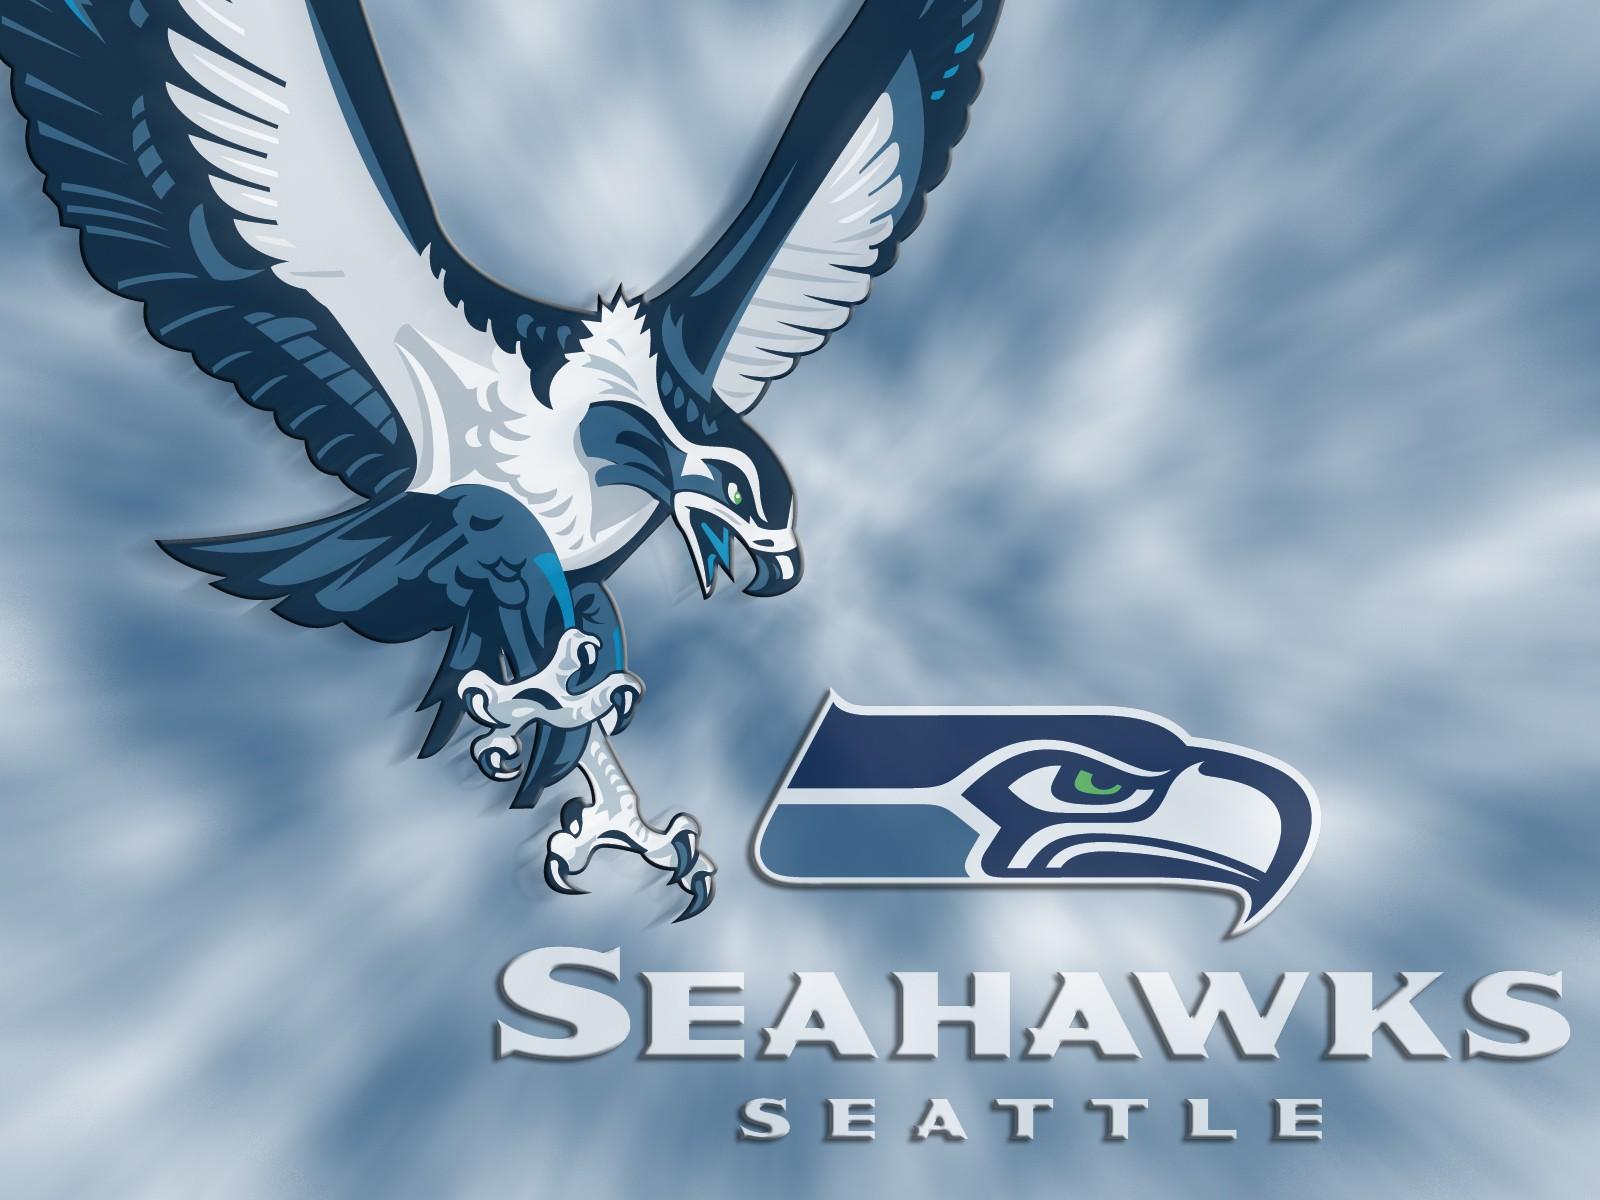 Seahawks Photos & image